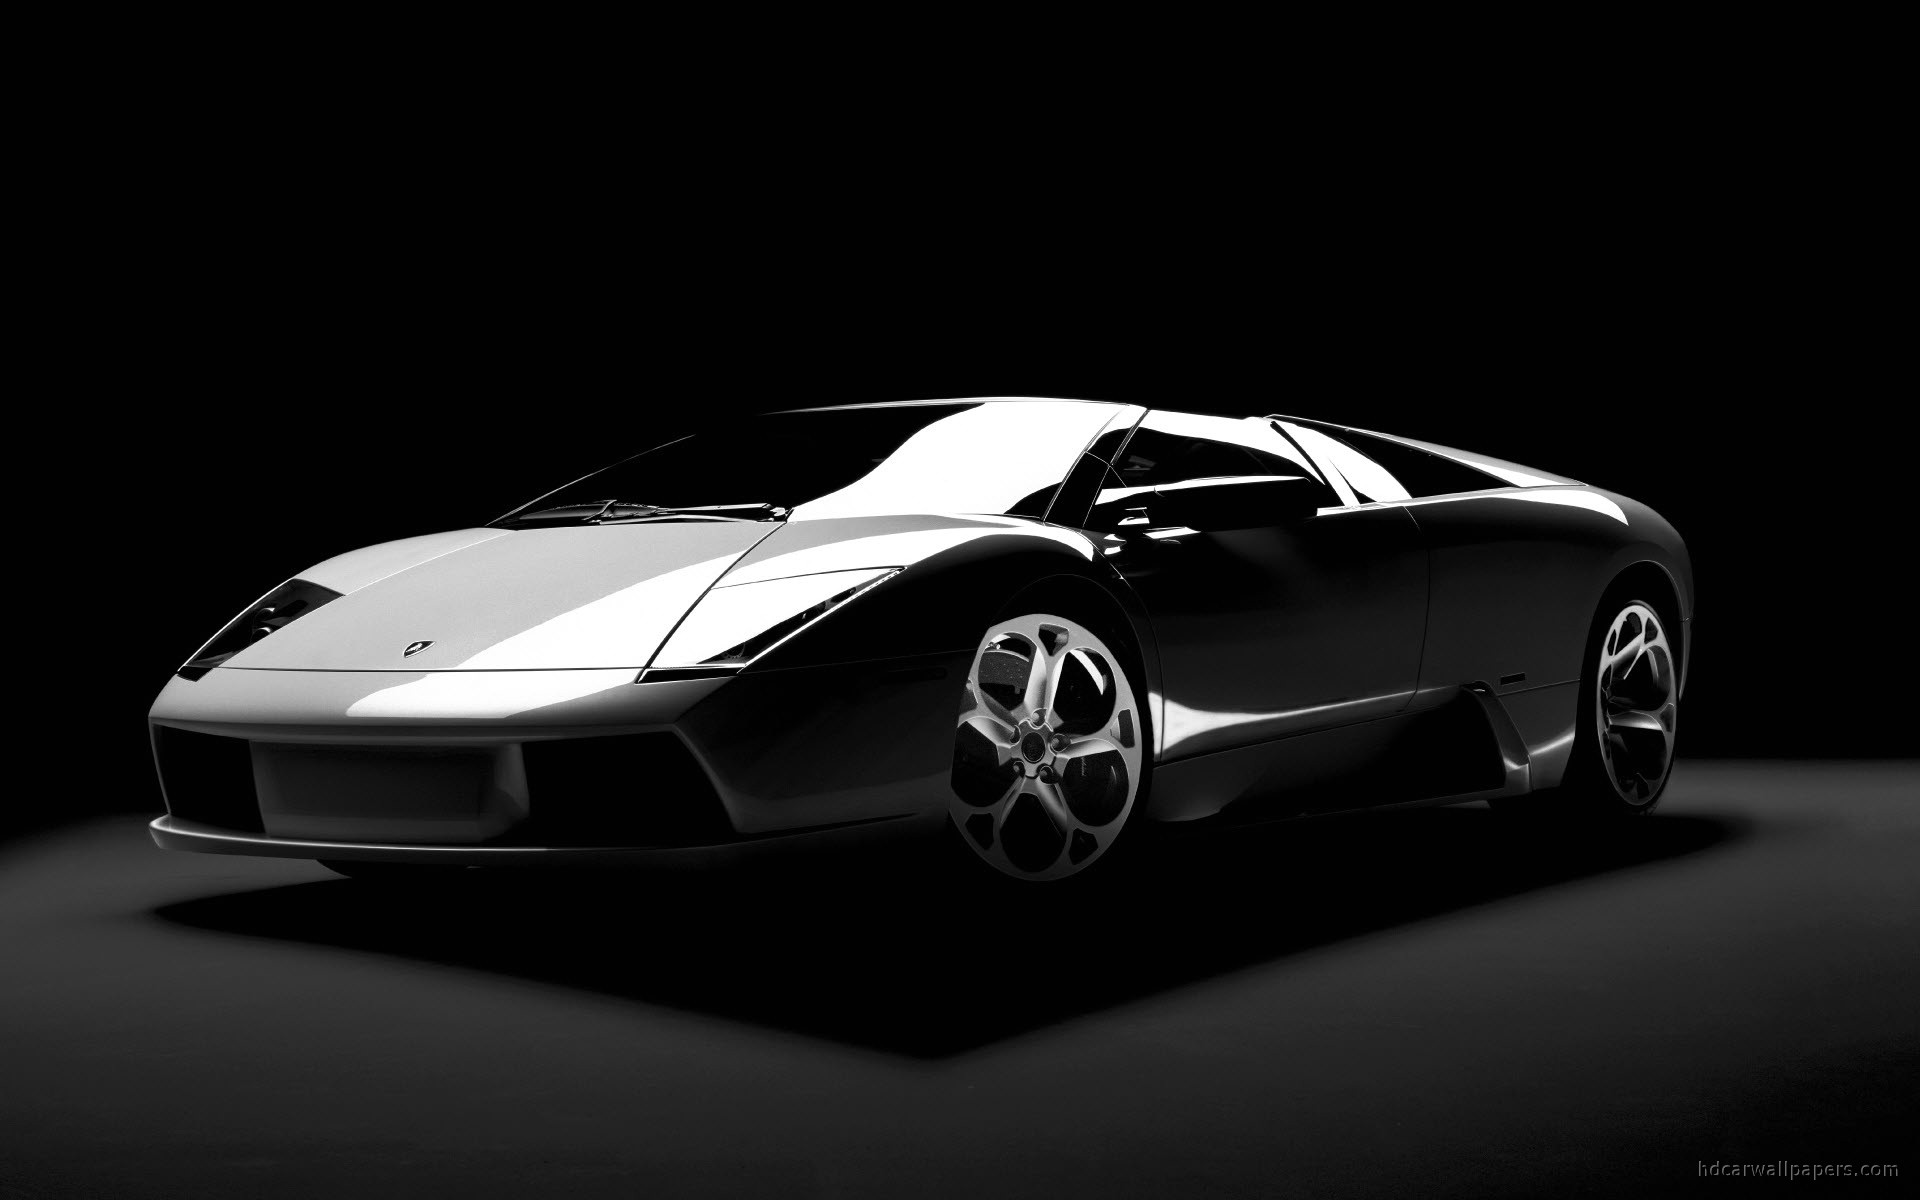 Lamborghini All New Wallpaper HD Car Wallpapers 1920x1200